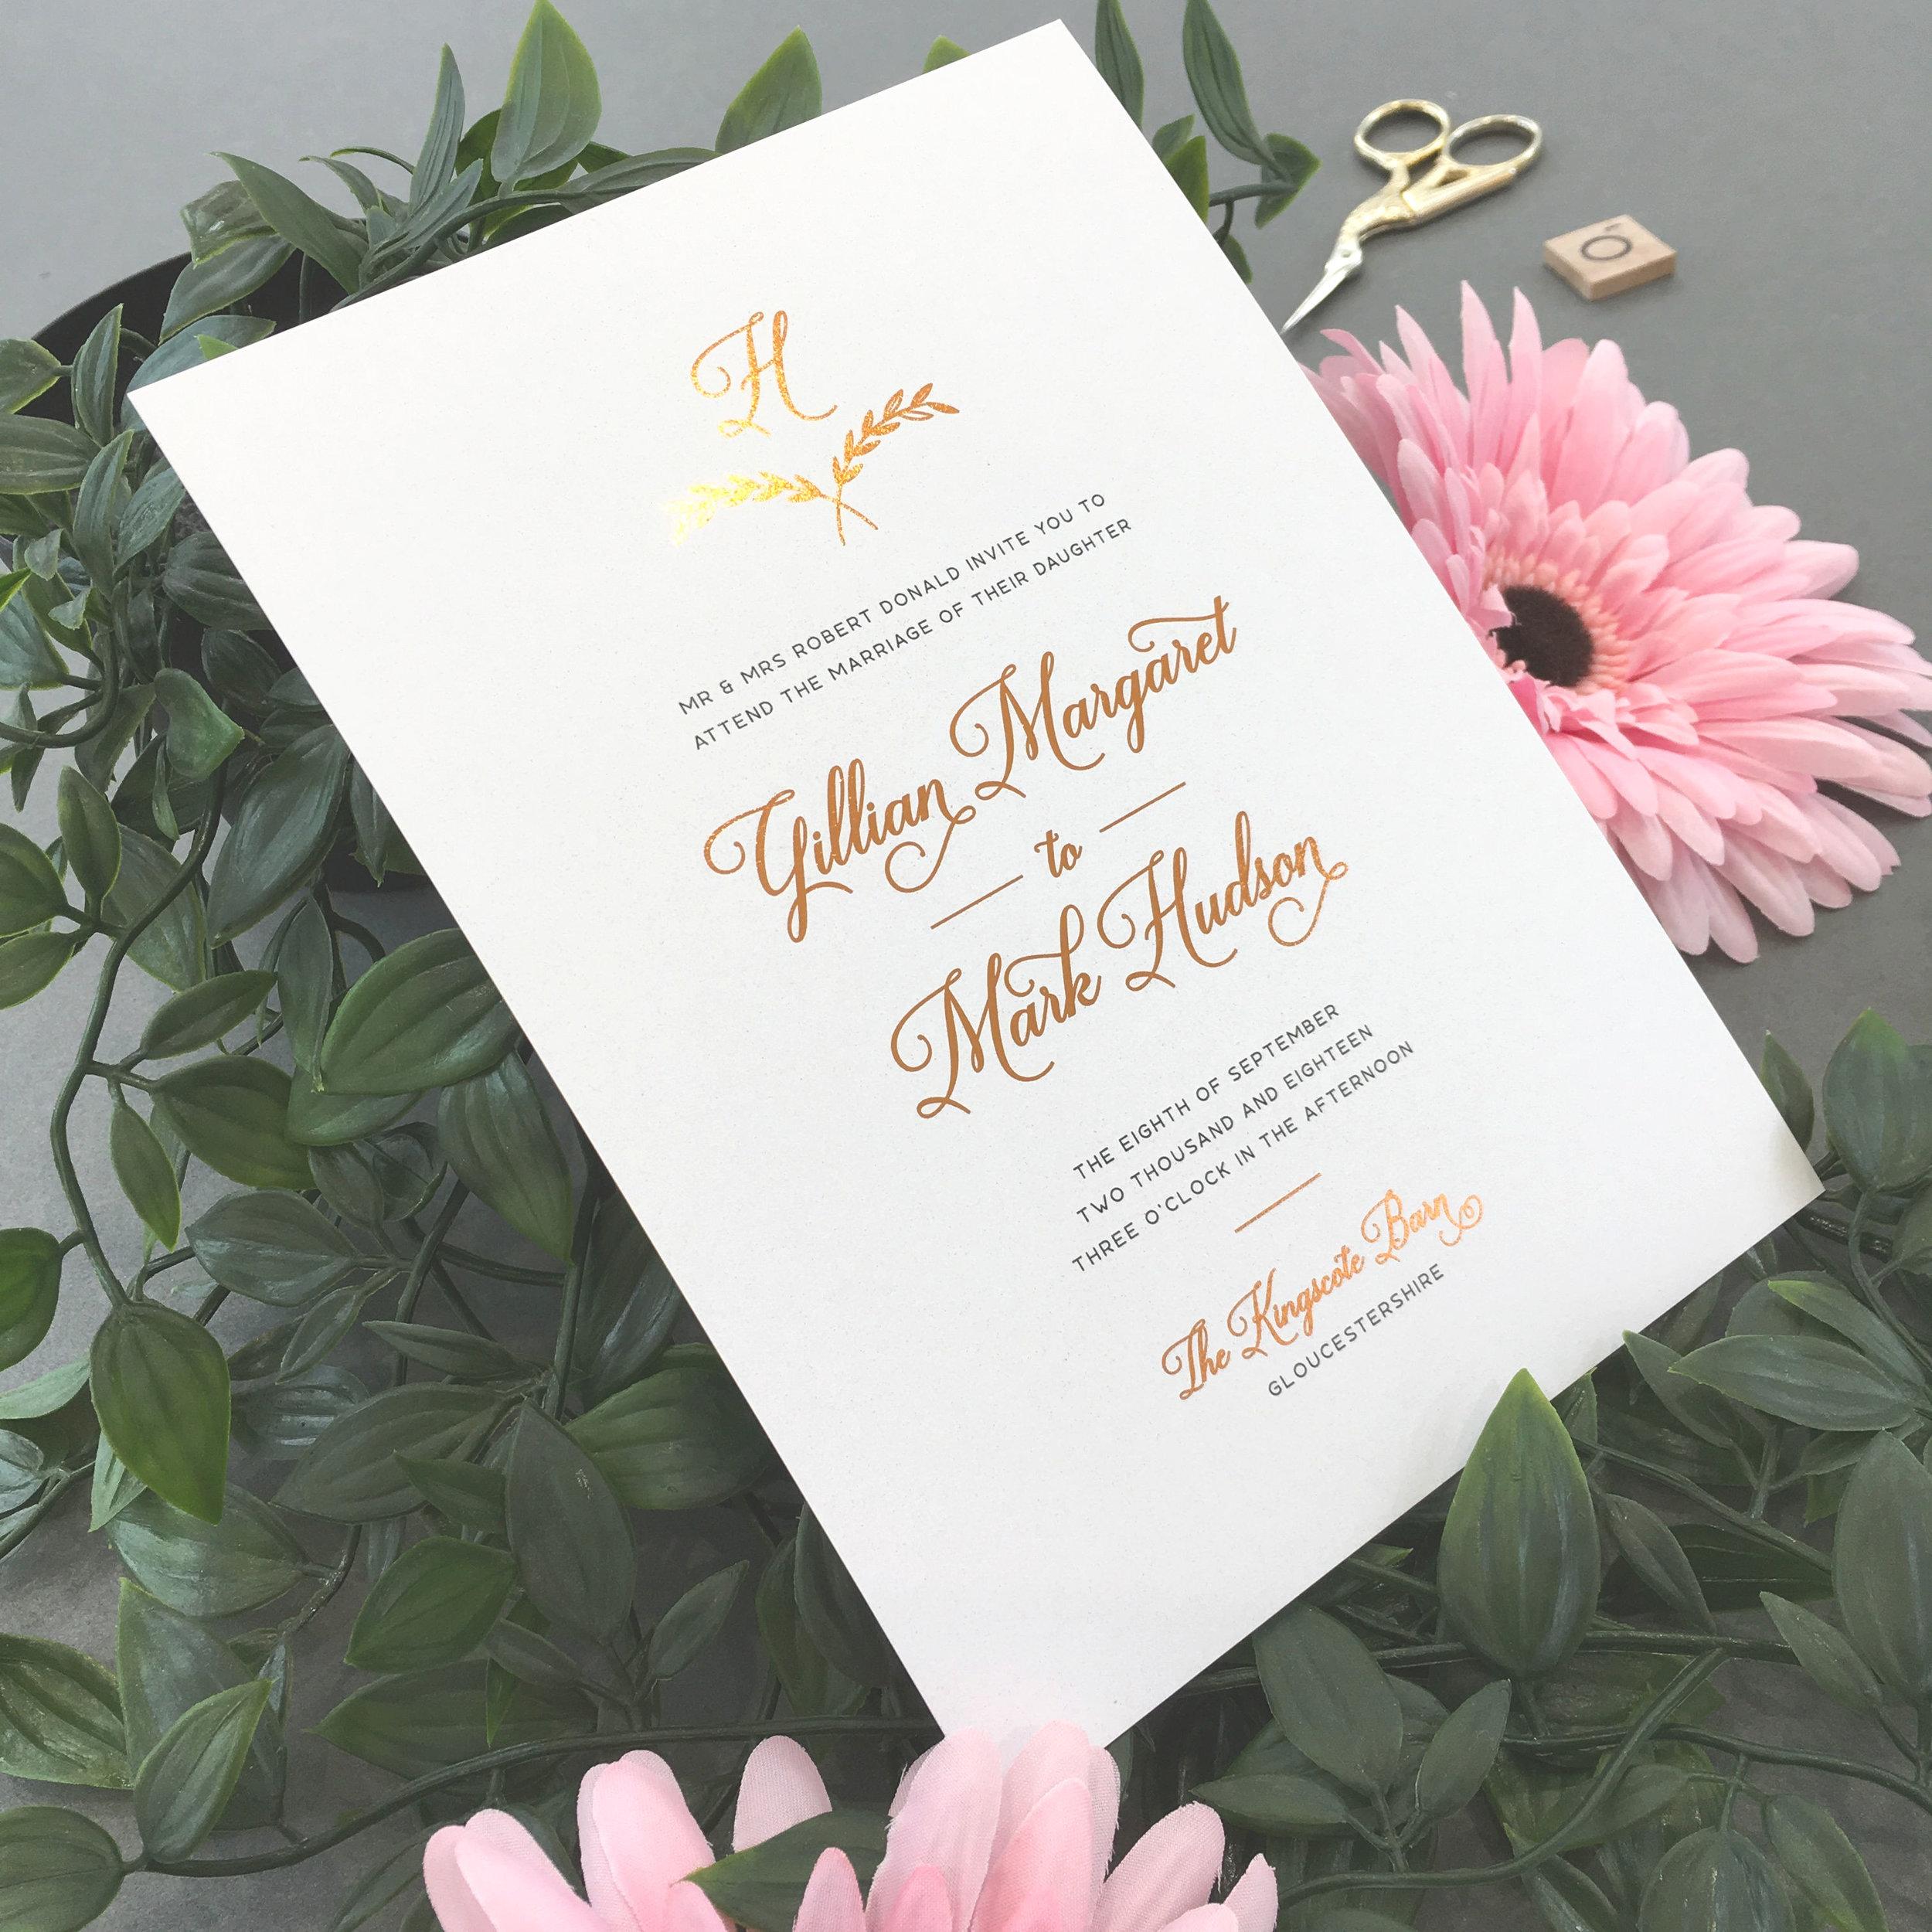 Paddington - Copper Foiled Invite.jpg